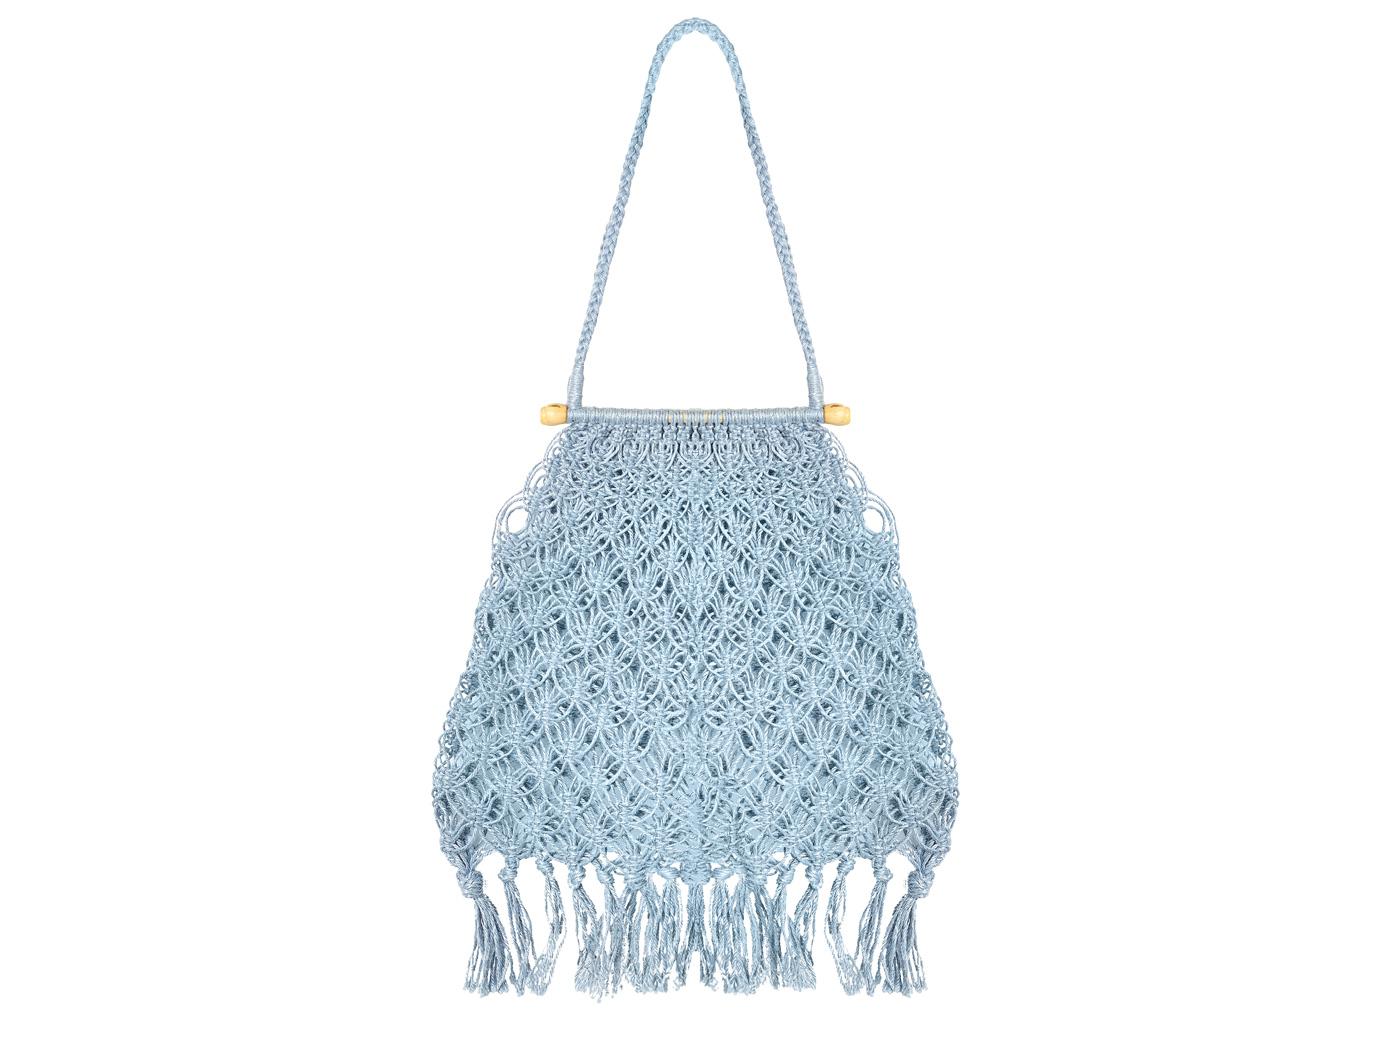 Golovina-fleur-macrame-bag-blue-11